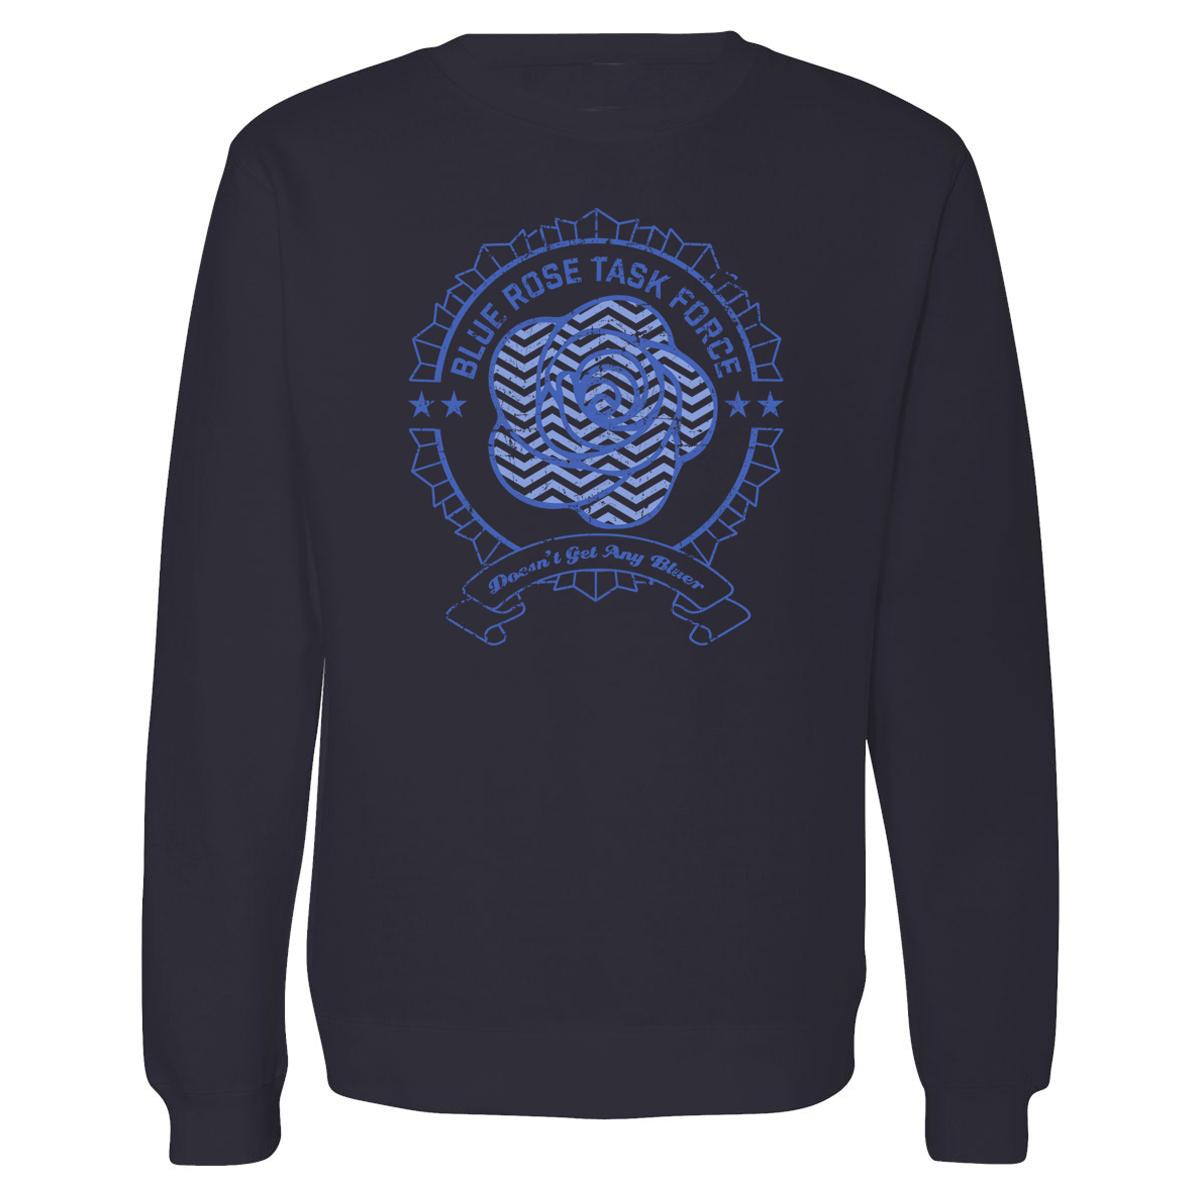 Twin Peaks Blue Rose Task Force Crewneck Sweatershirt